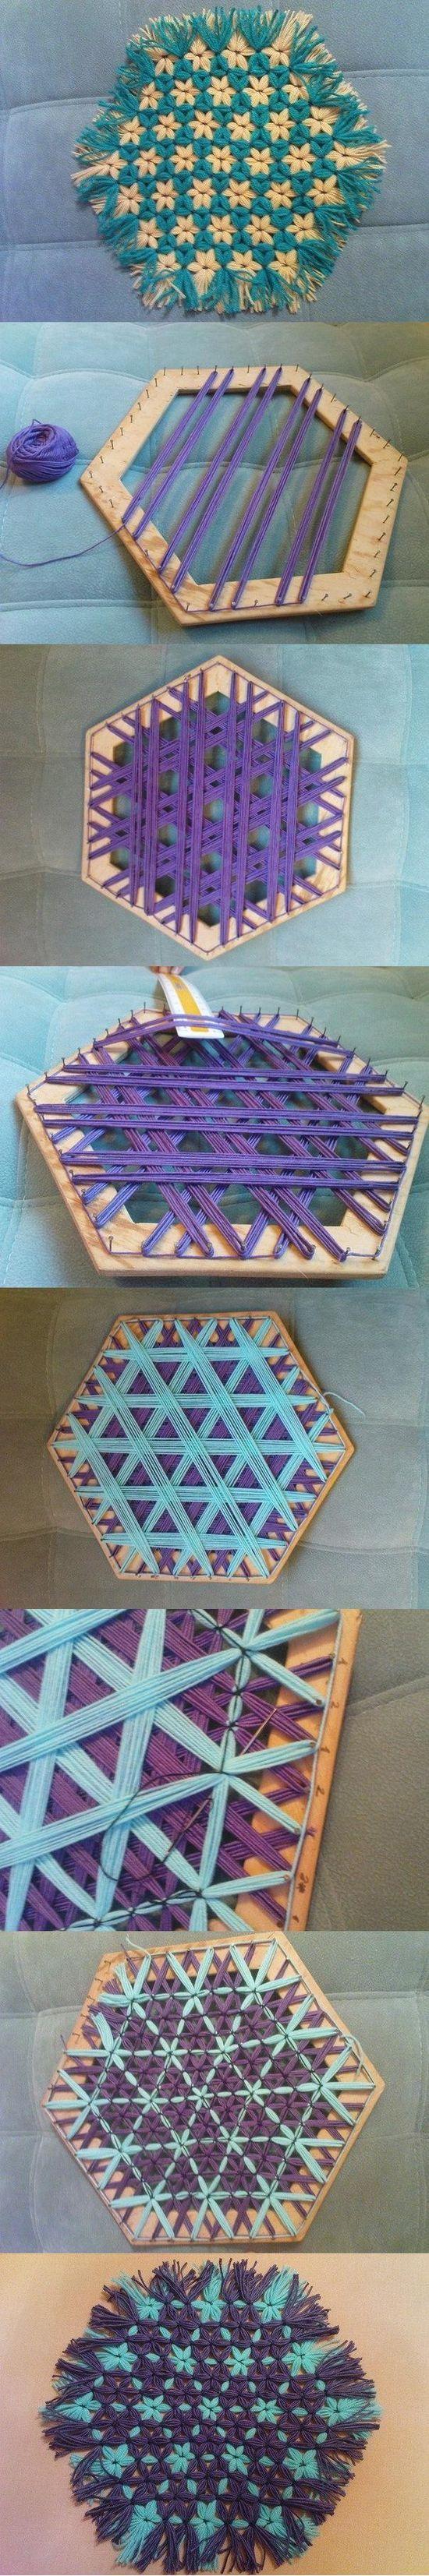 Hermosa alfombra hexagonal